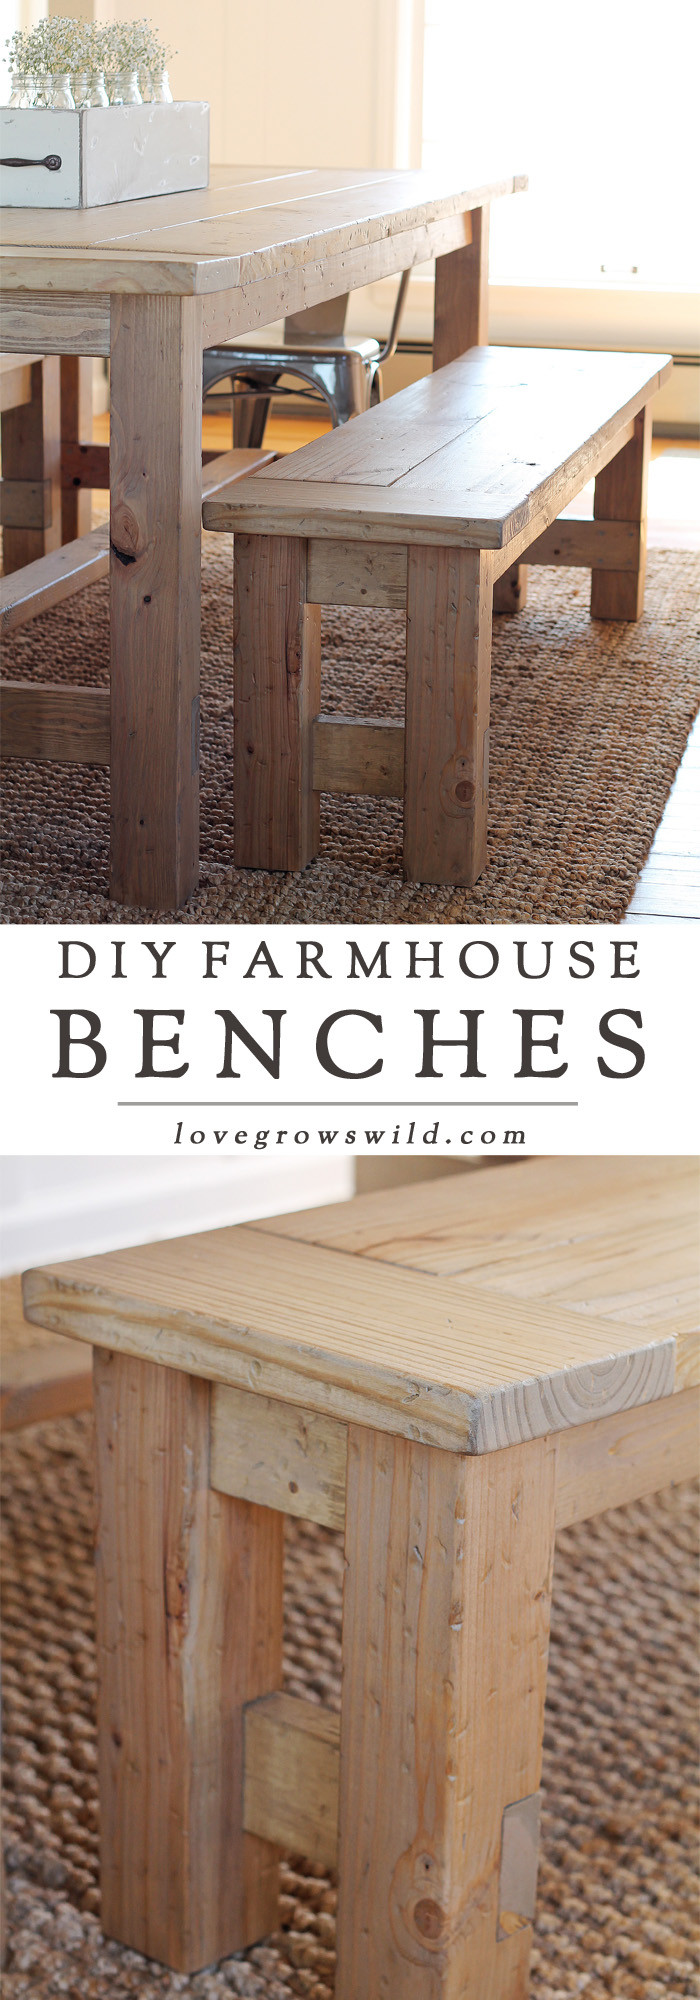 Best ideas about DIY Farmhouse Bench . Save or Pin DIY Farmhouse Bench Love Grows Wild Now.